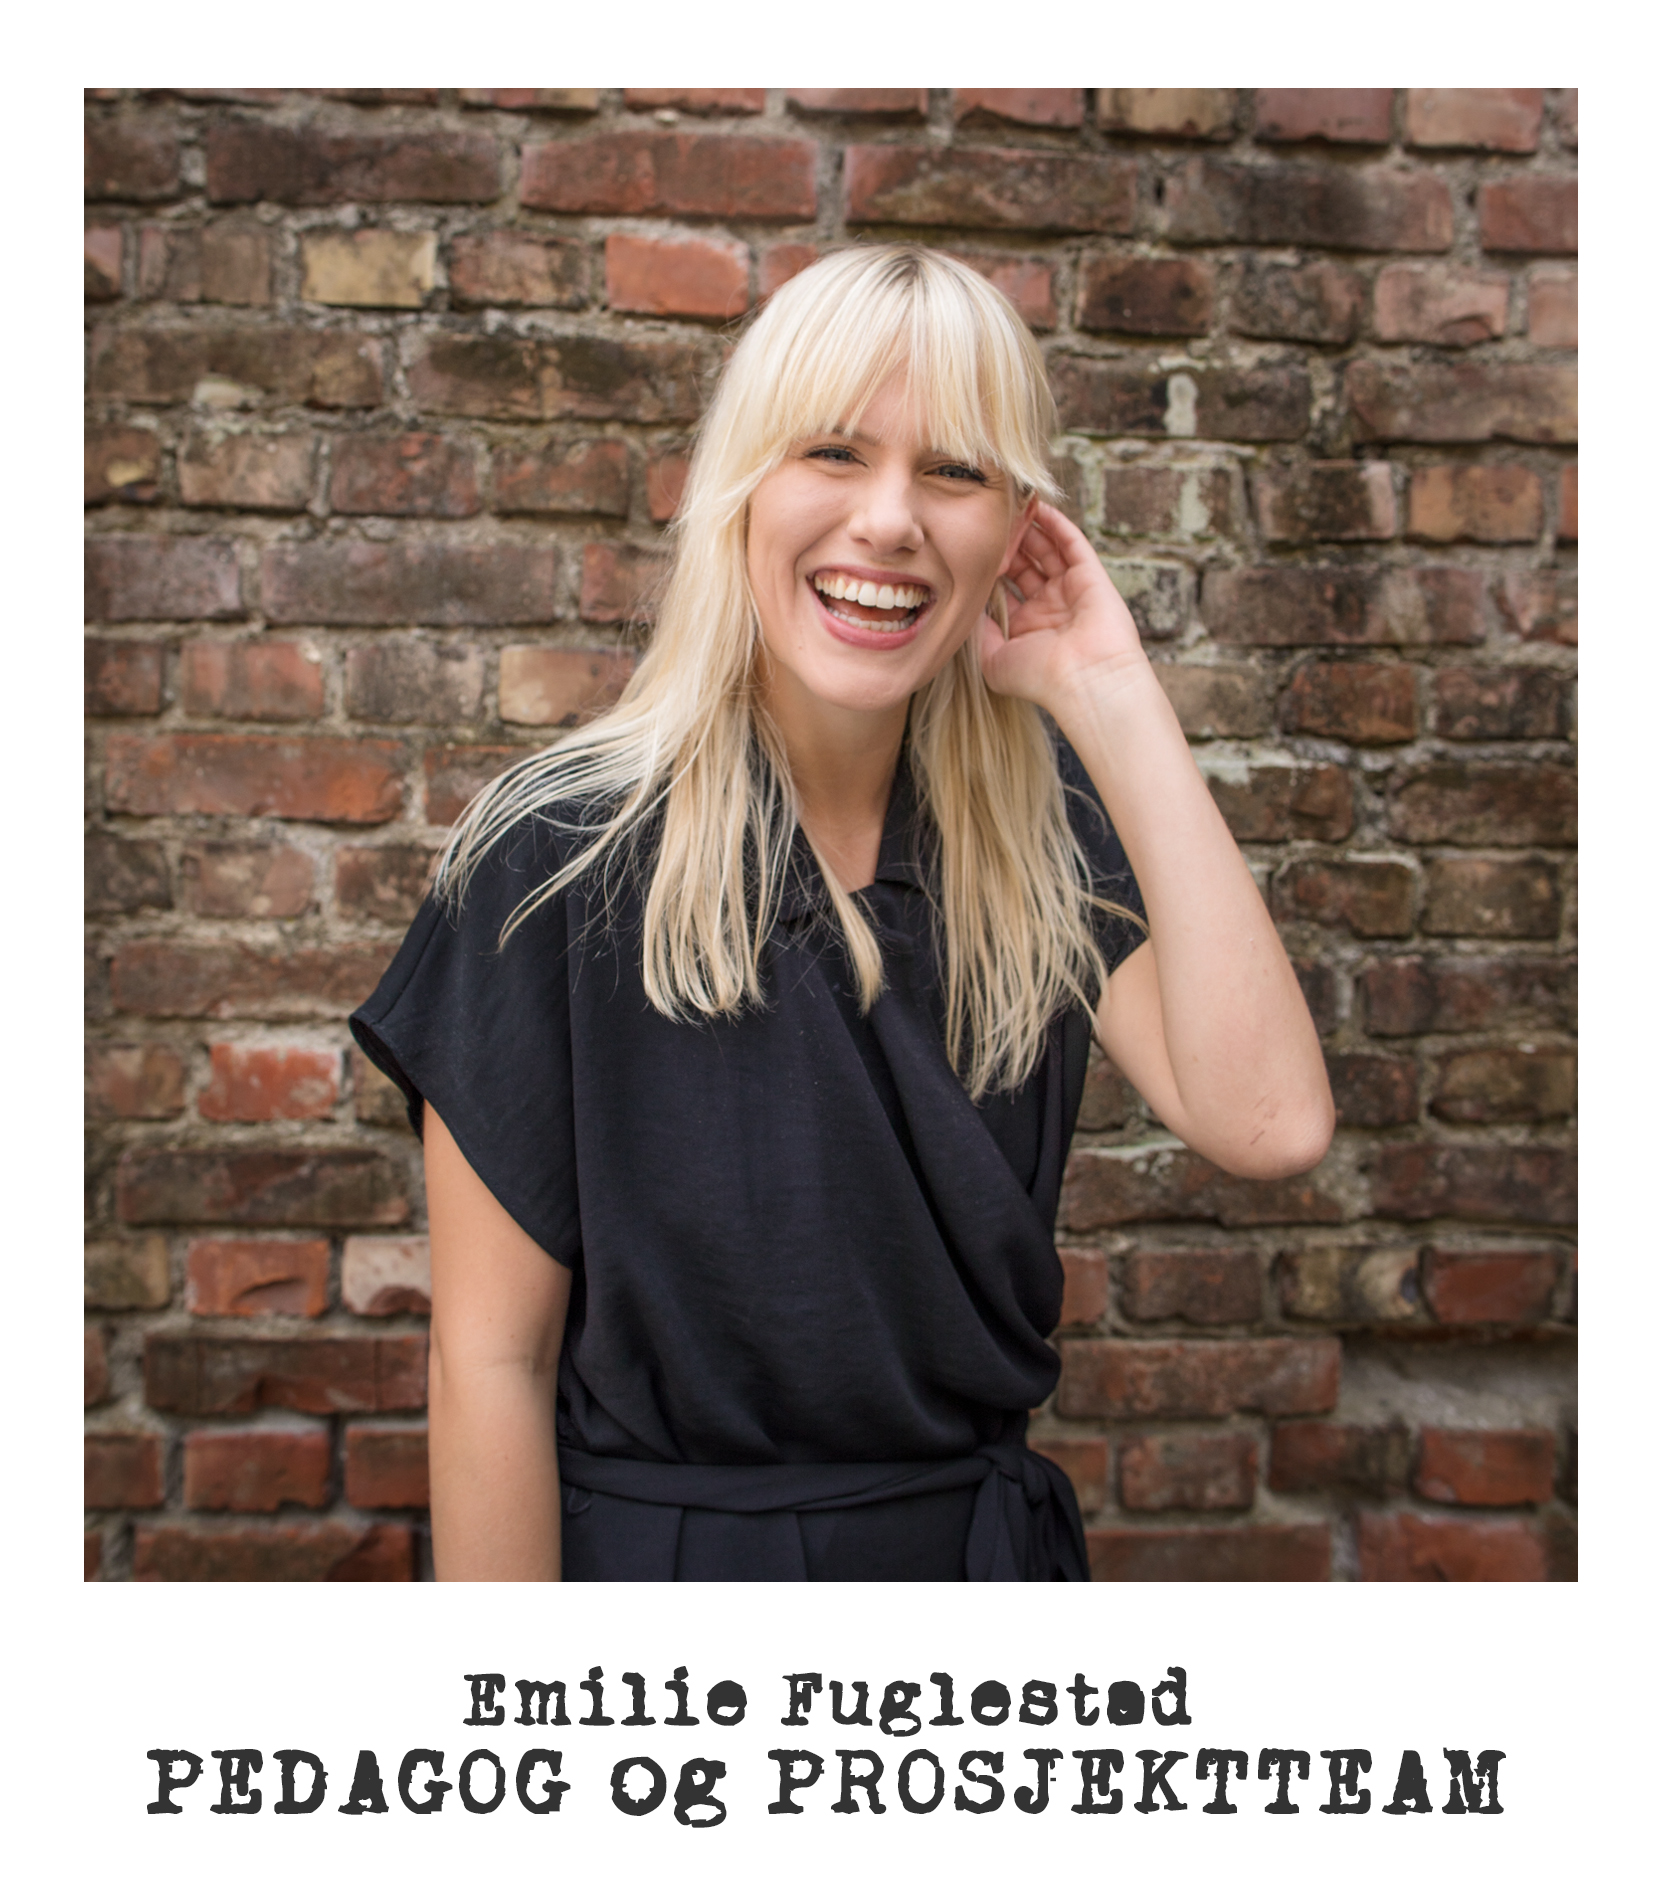 Emilie Fuglestad